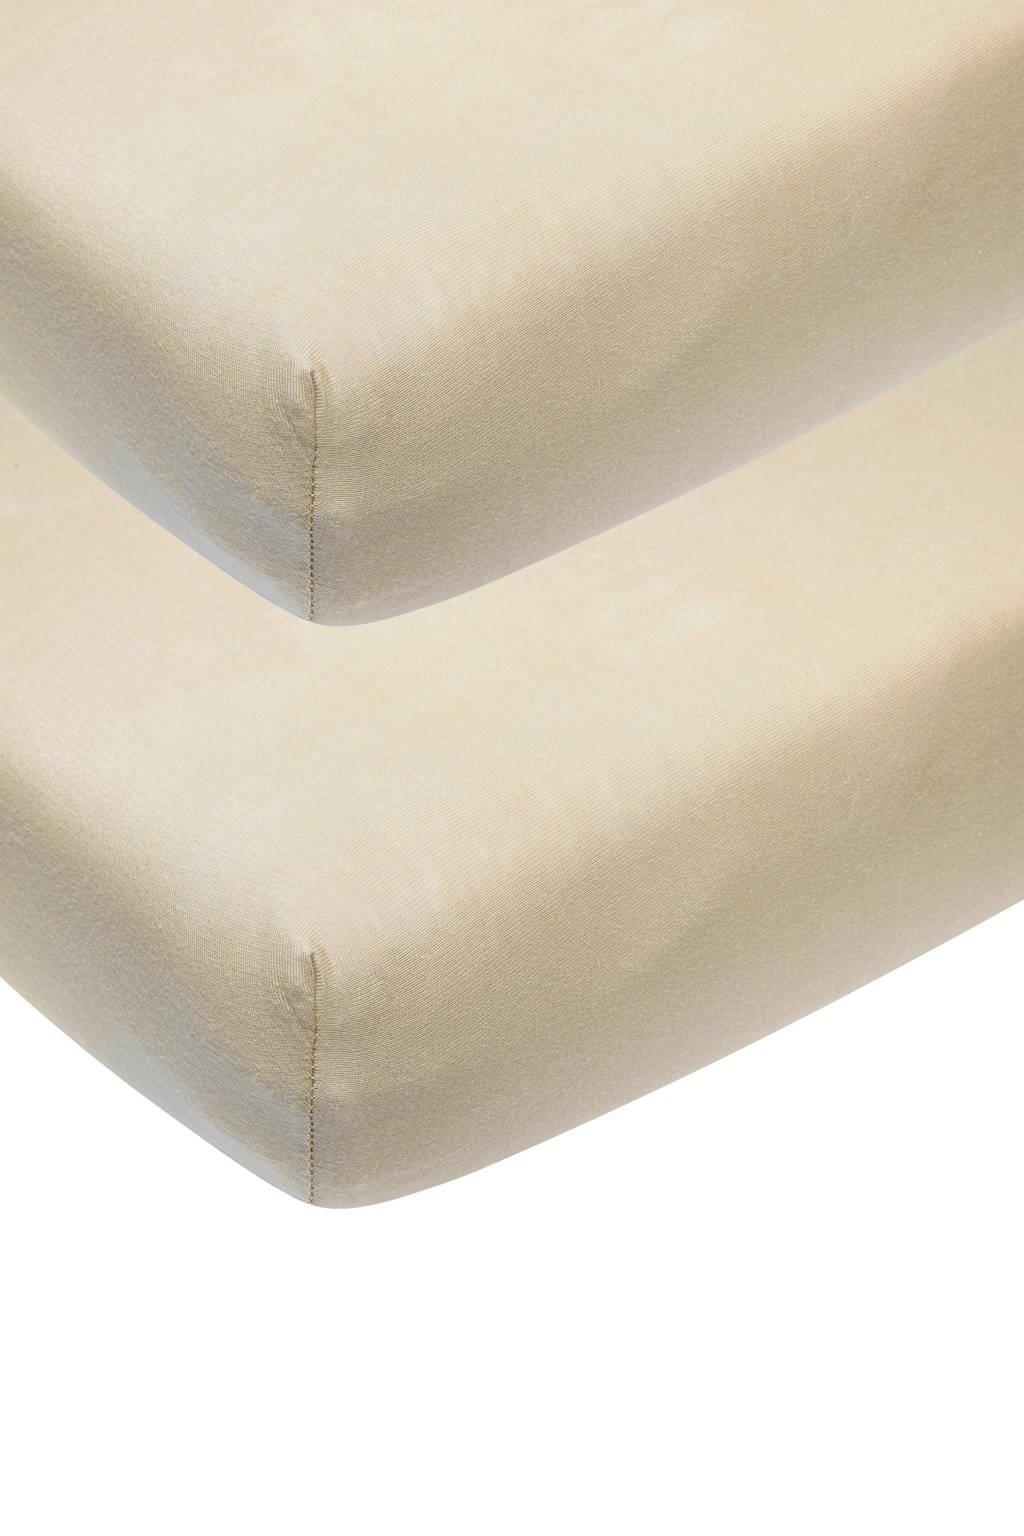 Meyco katoenen jersey hoeslaken wieg 40x80/90 cm (set van 2), Zand